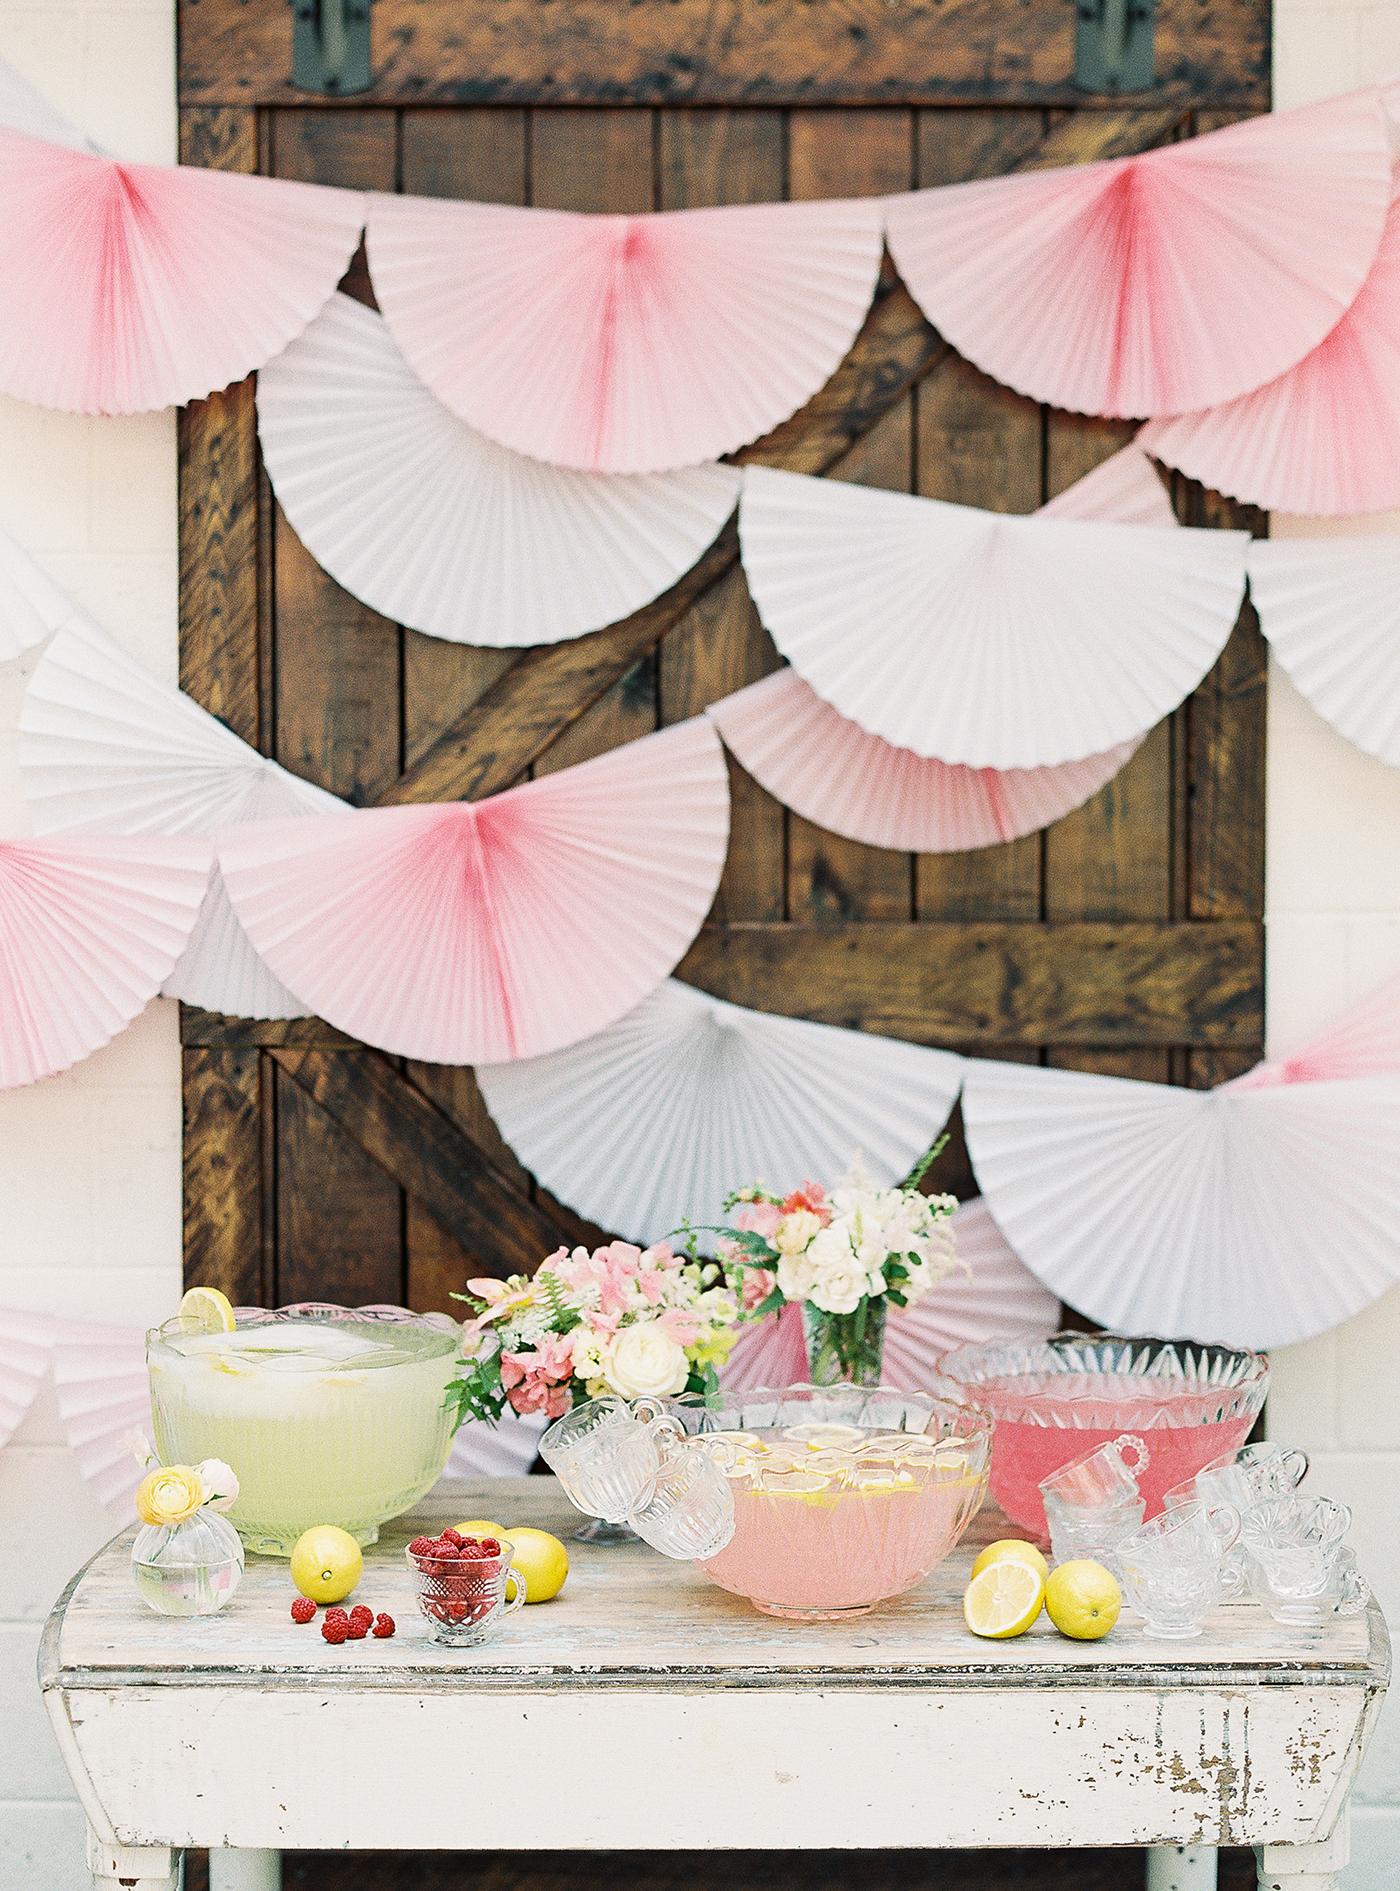 scalloped wedding decor pink fan backdrop drink table